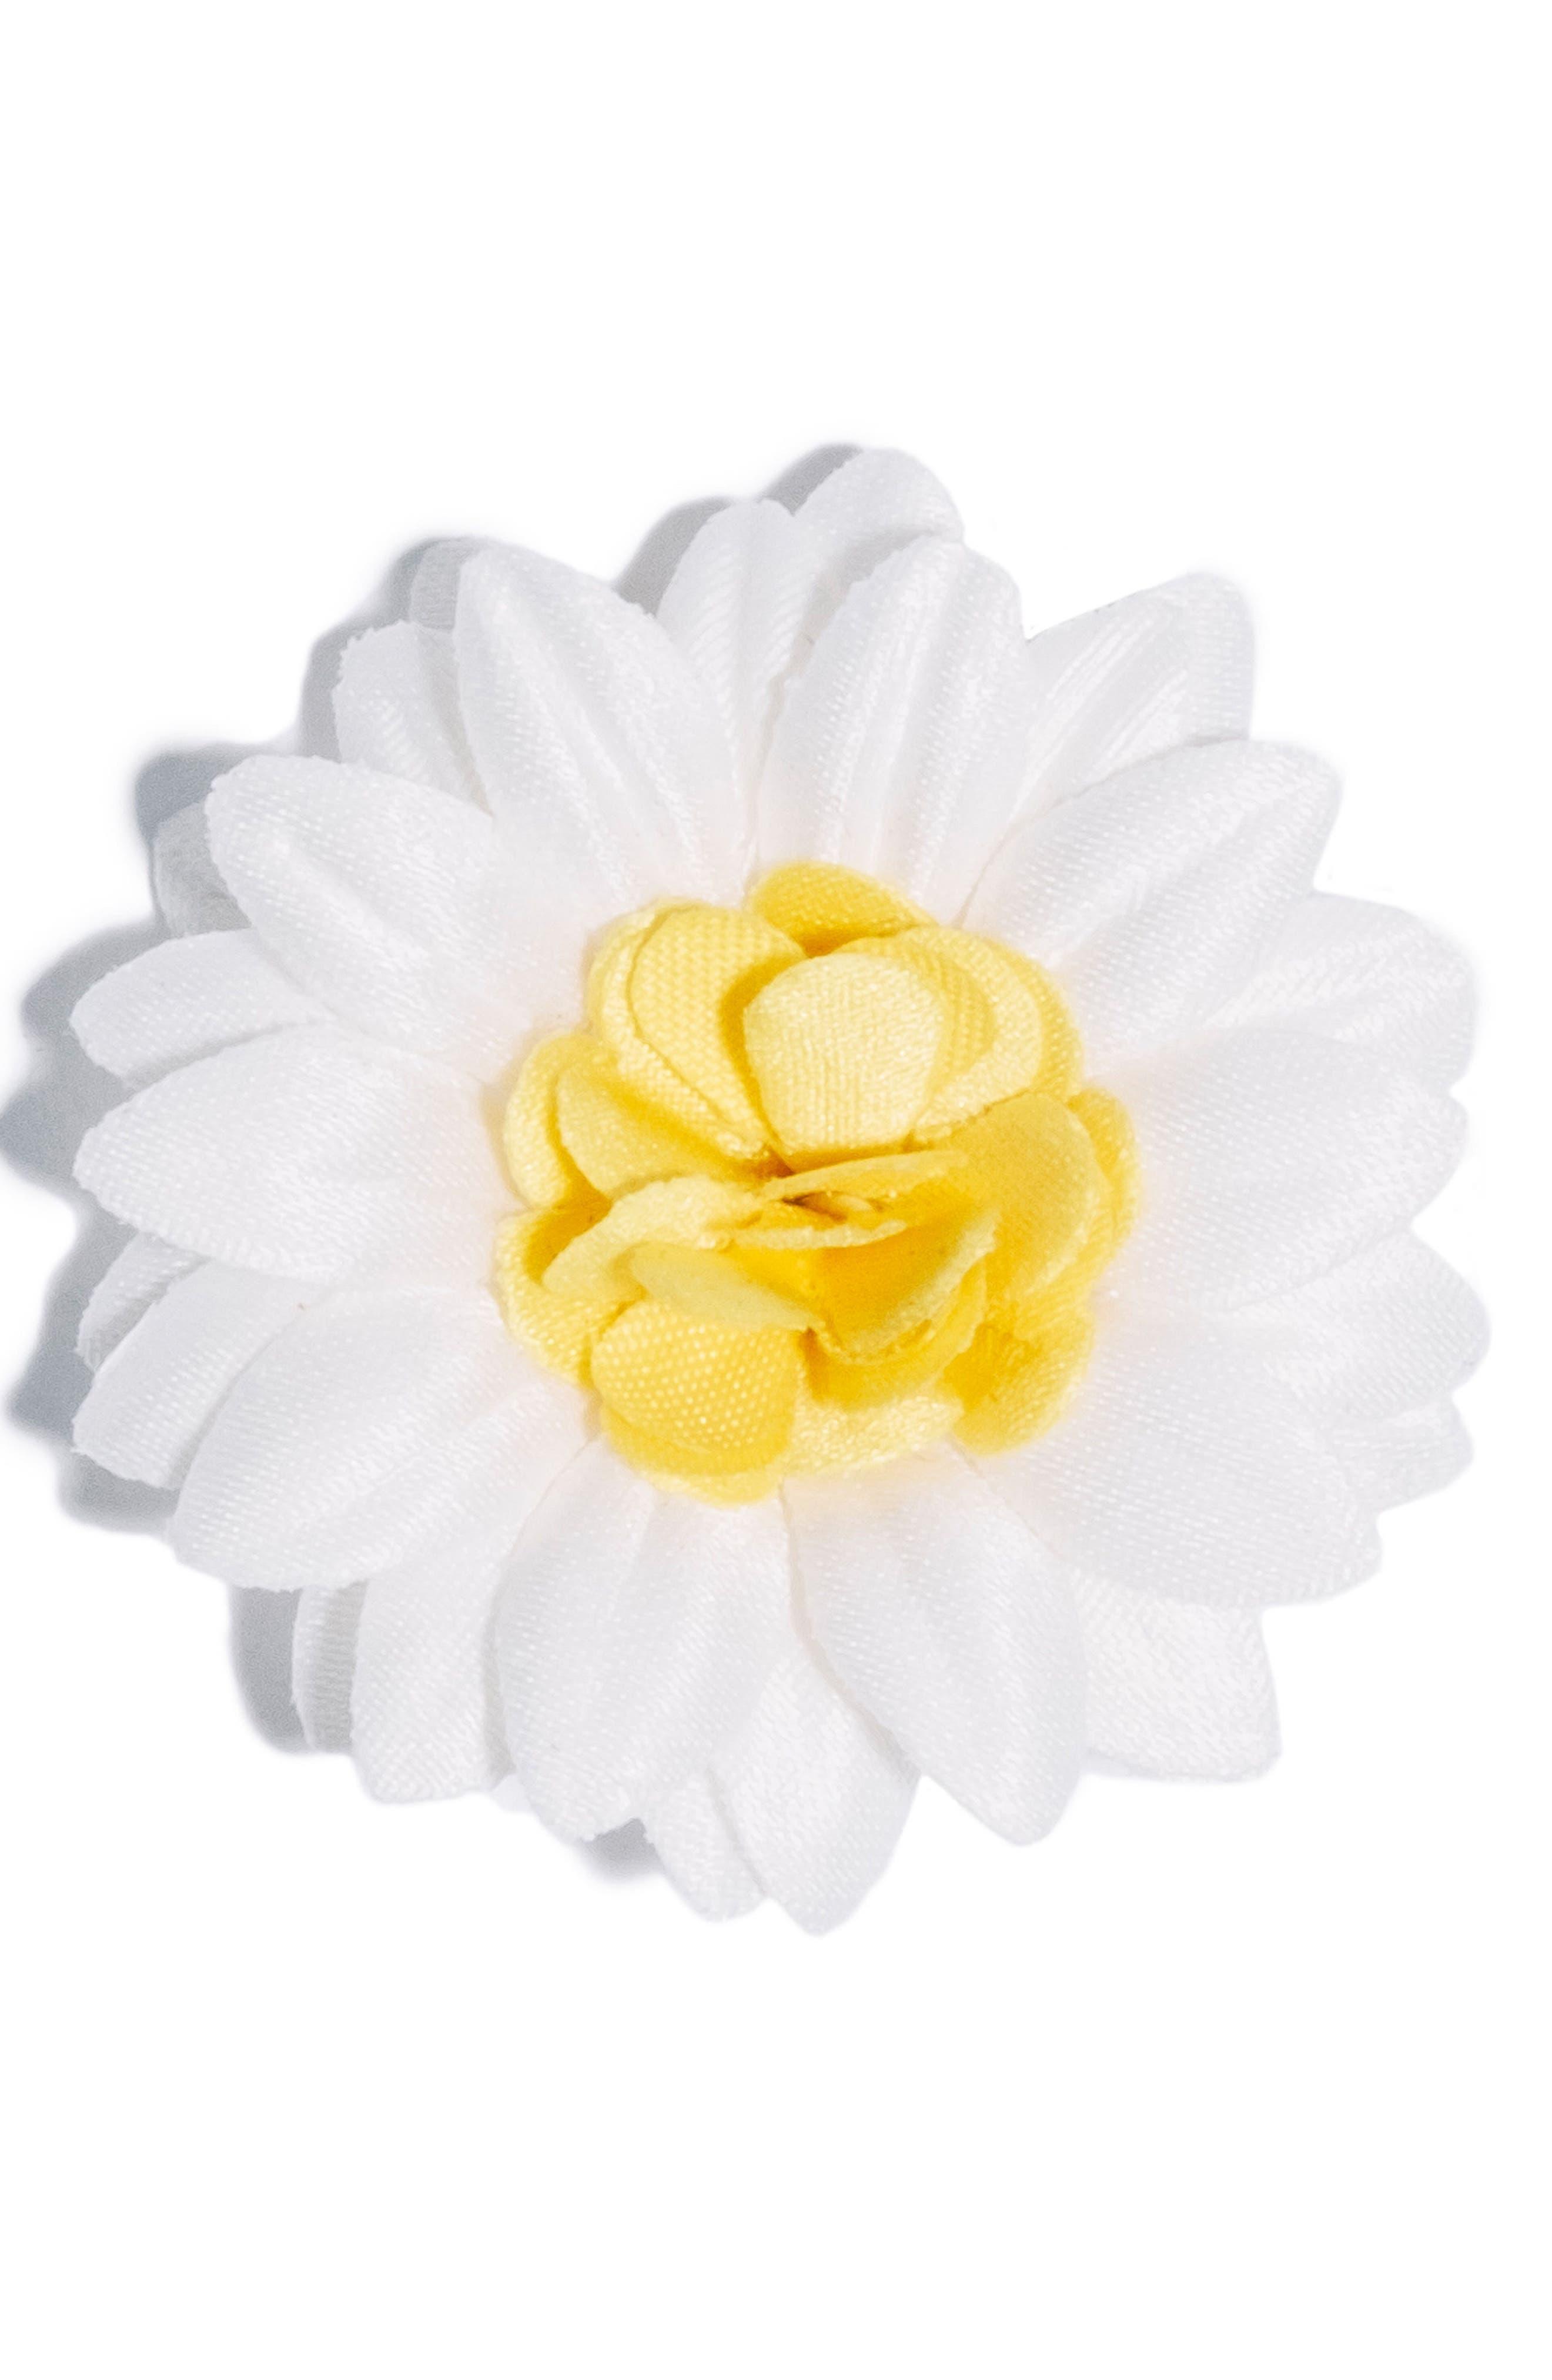 hook + ALBERT Satin Daisy Lapel Flower